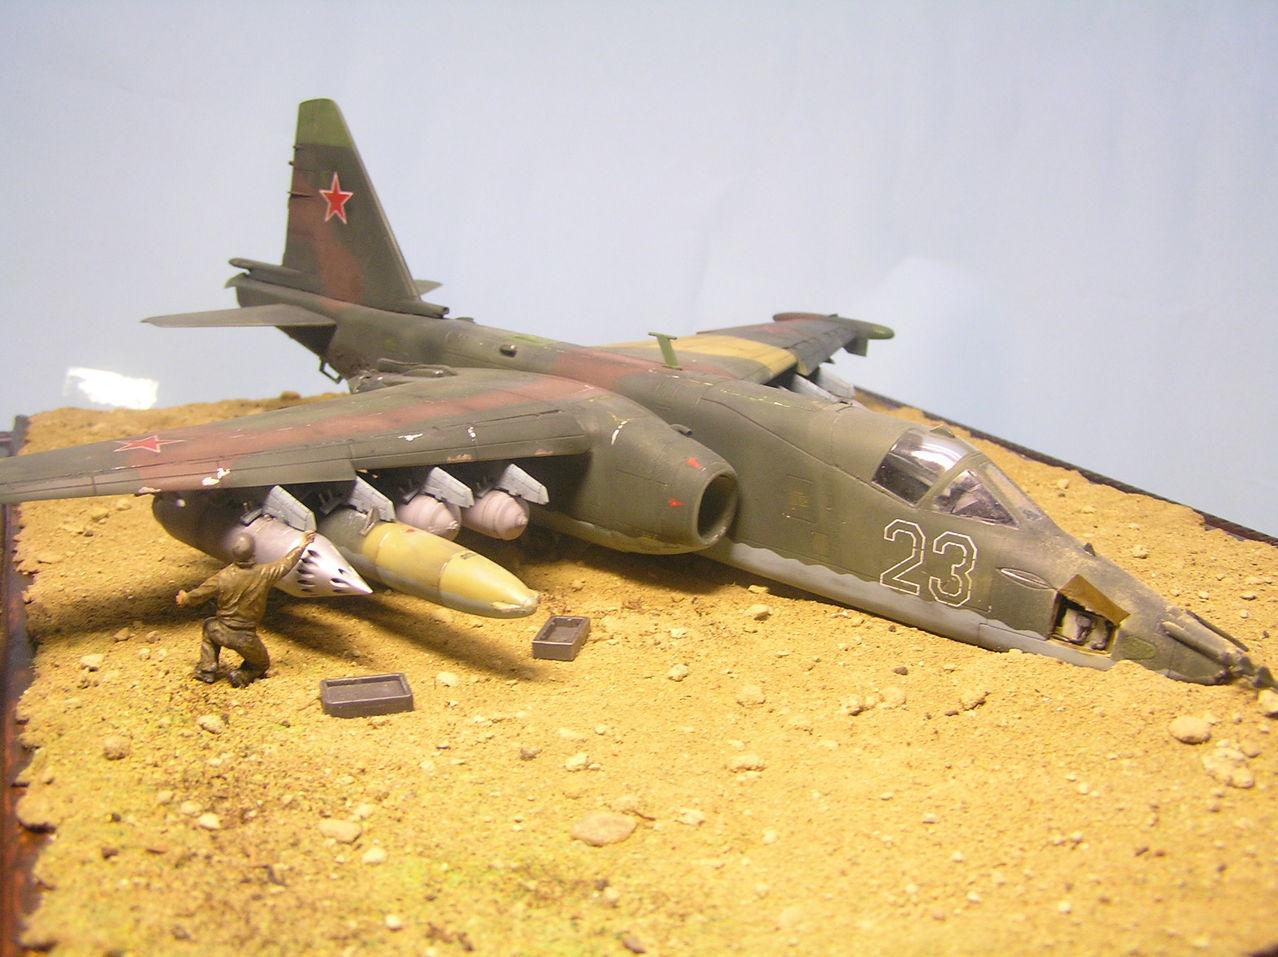 Su-25 1/48  OEZ...Ιστοριες απο το Αφγανισταν !!! - Σελίδα 2 Image